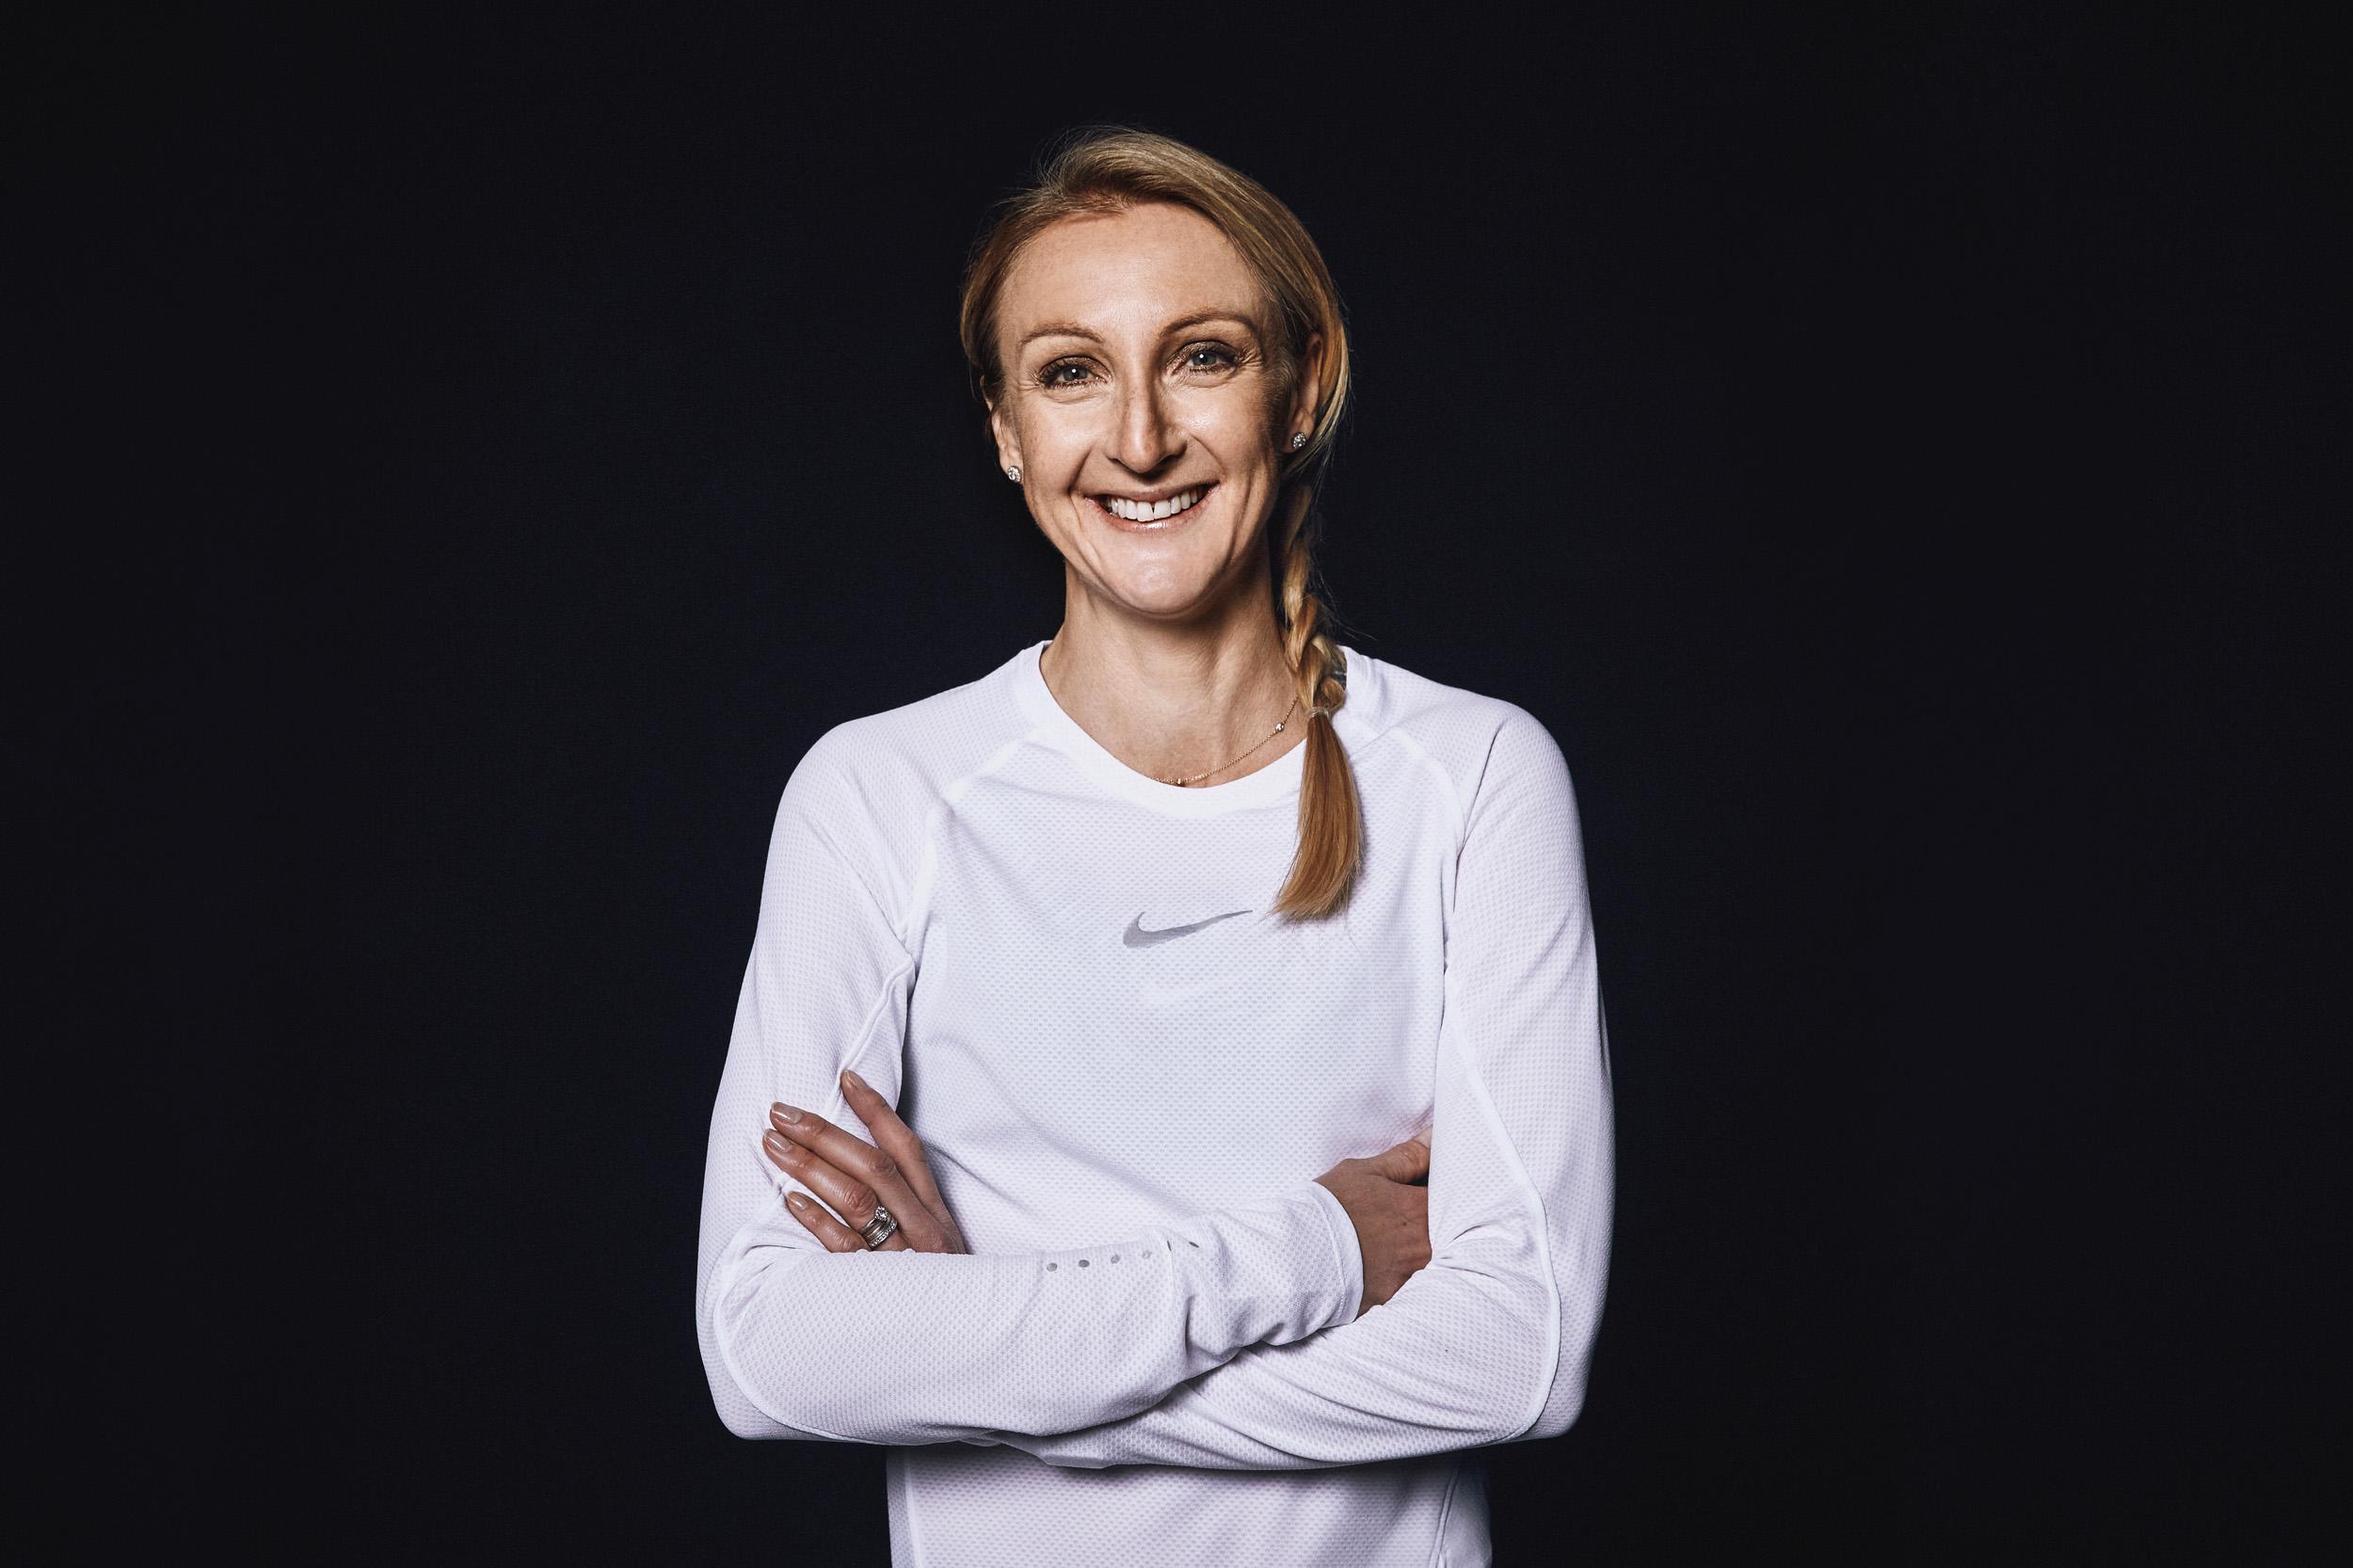 Record-breaking runner Paula Radcliffe announced as Muscat Marathon ambassador